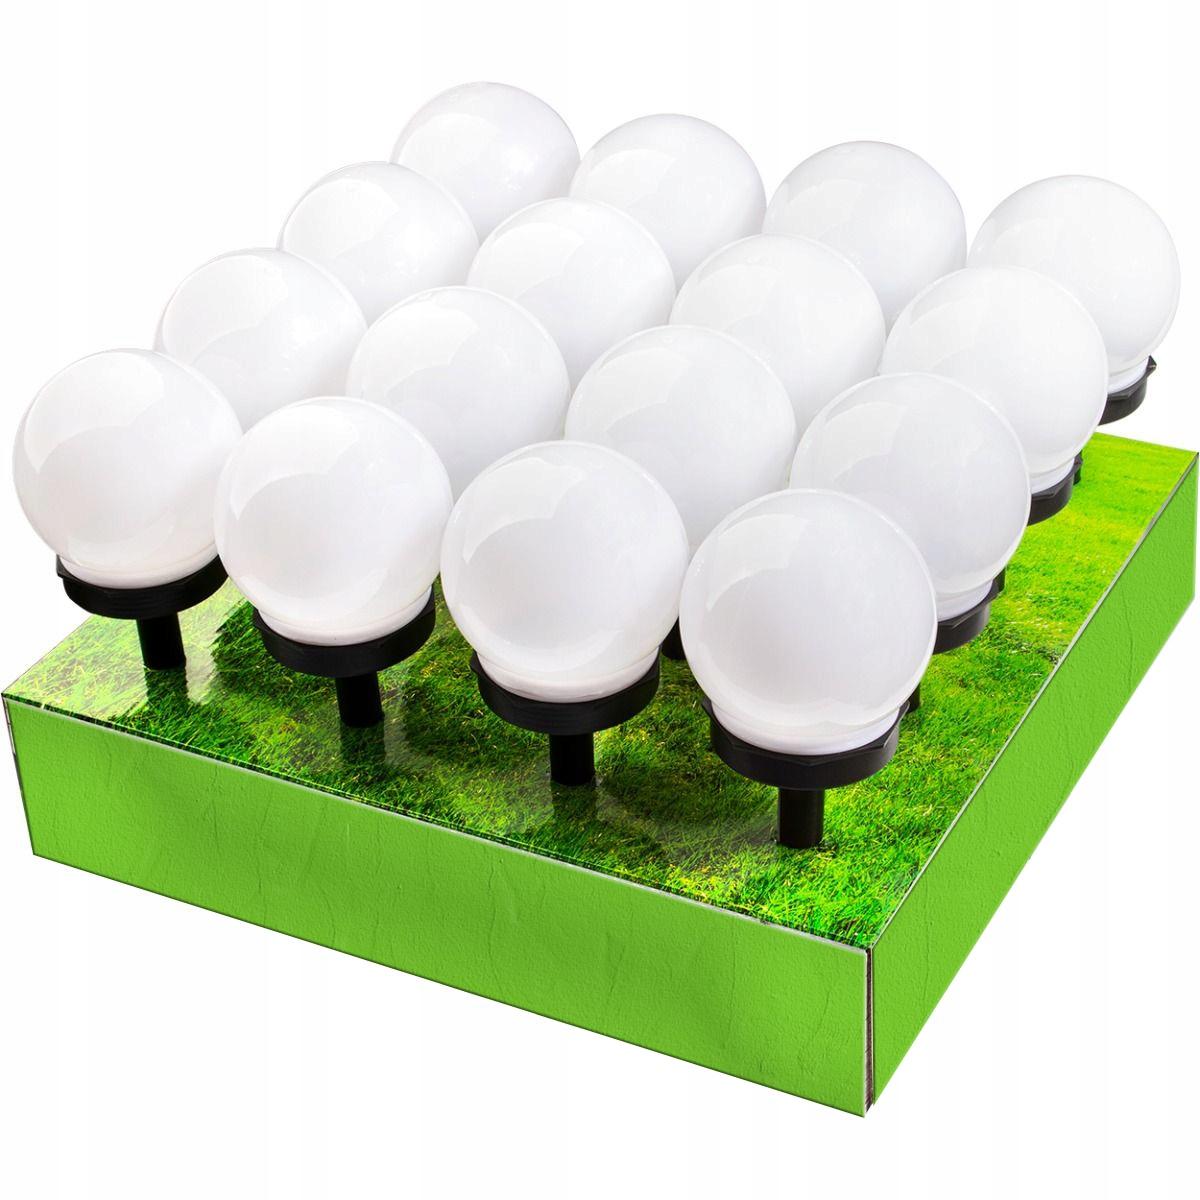 16x Lampa Ogrodowa LED SOLARNA kula biała 10 CM